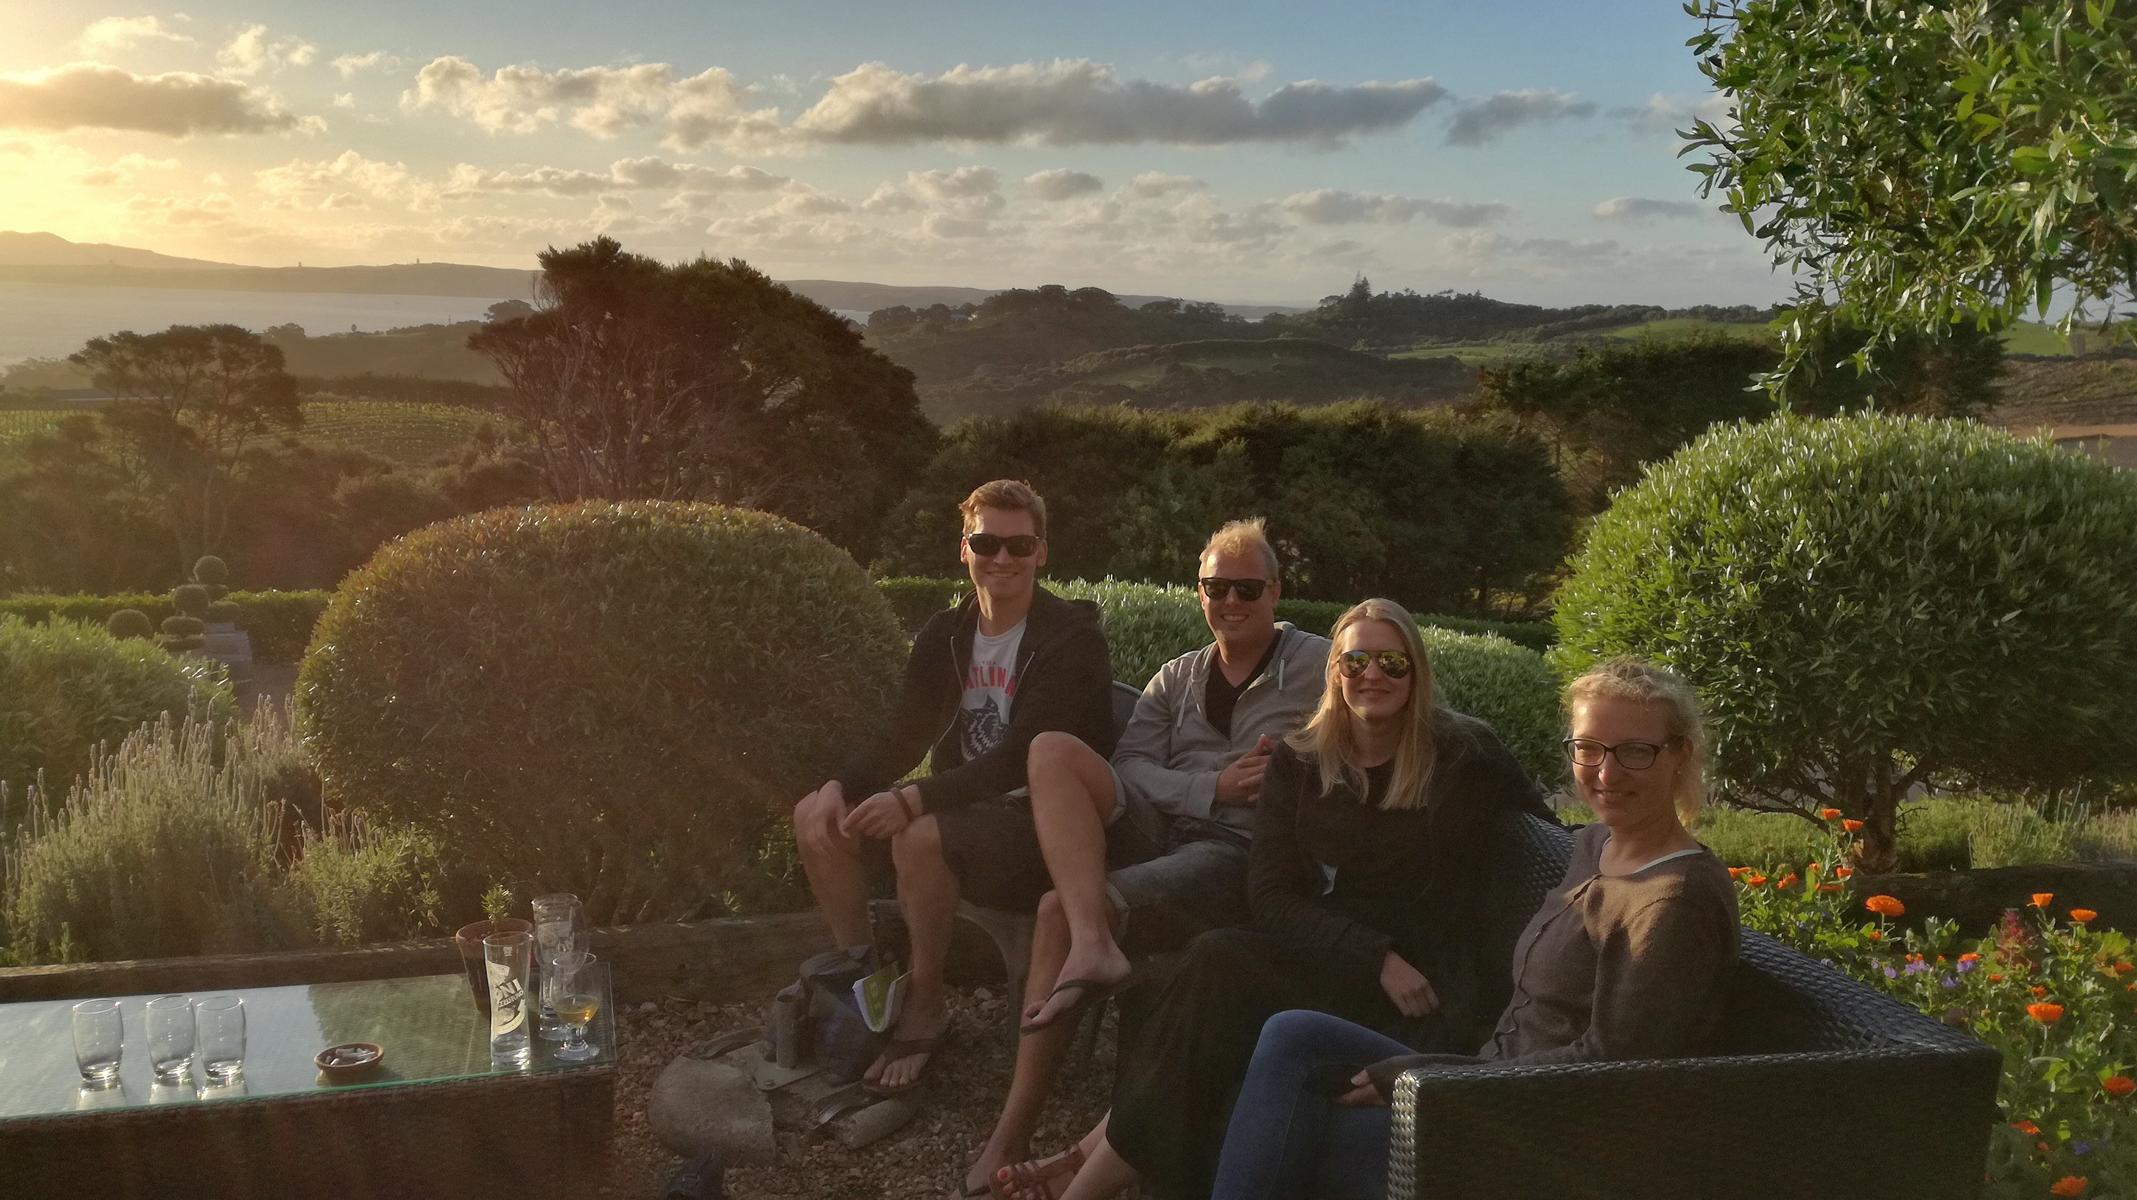 waiheke-island-neuseeland-tipps-highlights-reise-backpacking-10